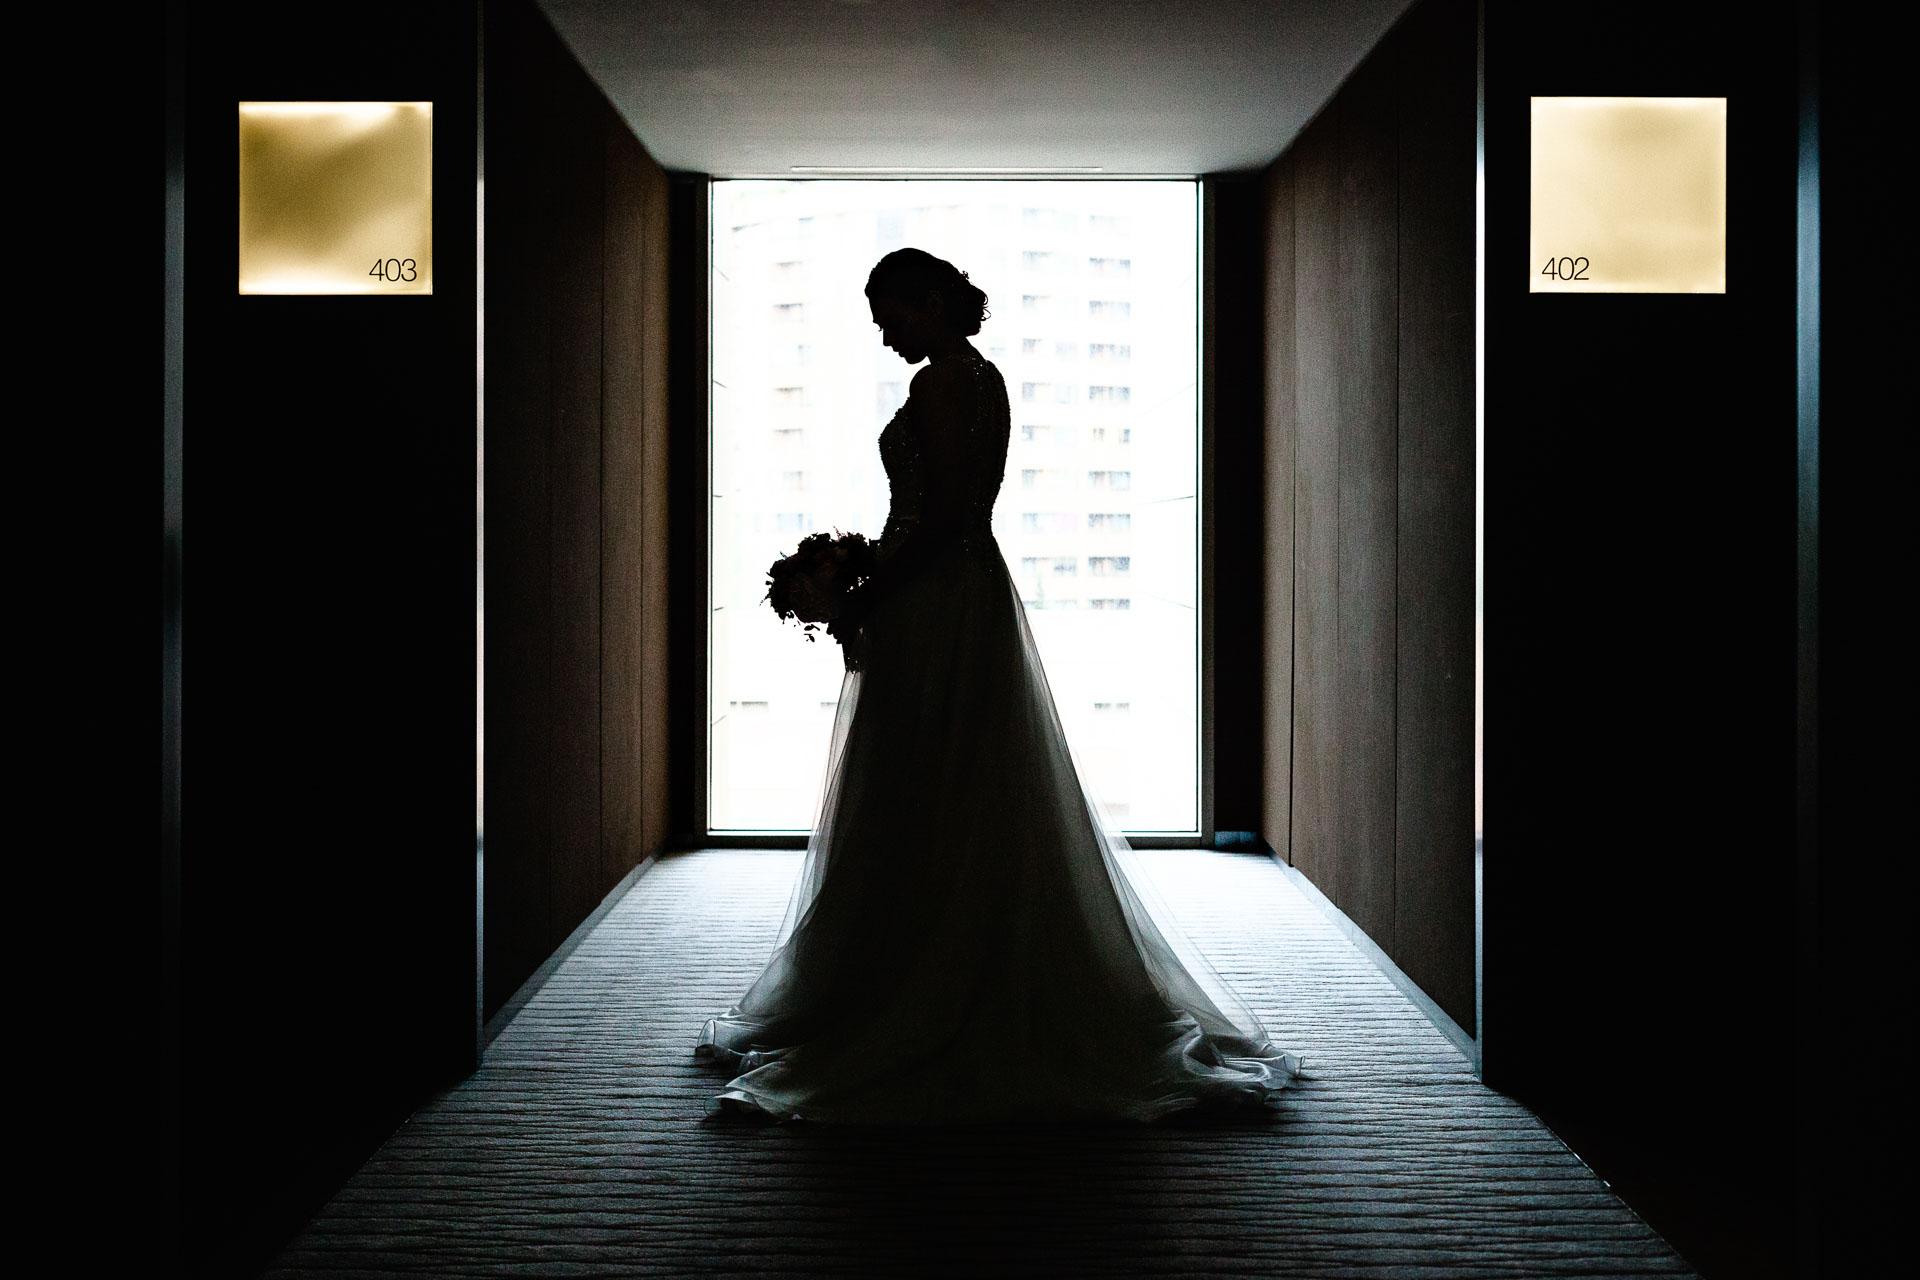 Boda Zaragoza Hotel Reina Petronila, Preparativos Novia Retrato a Contraluz